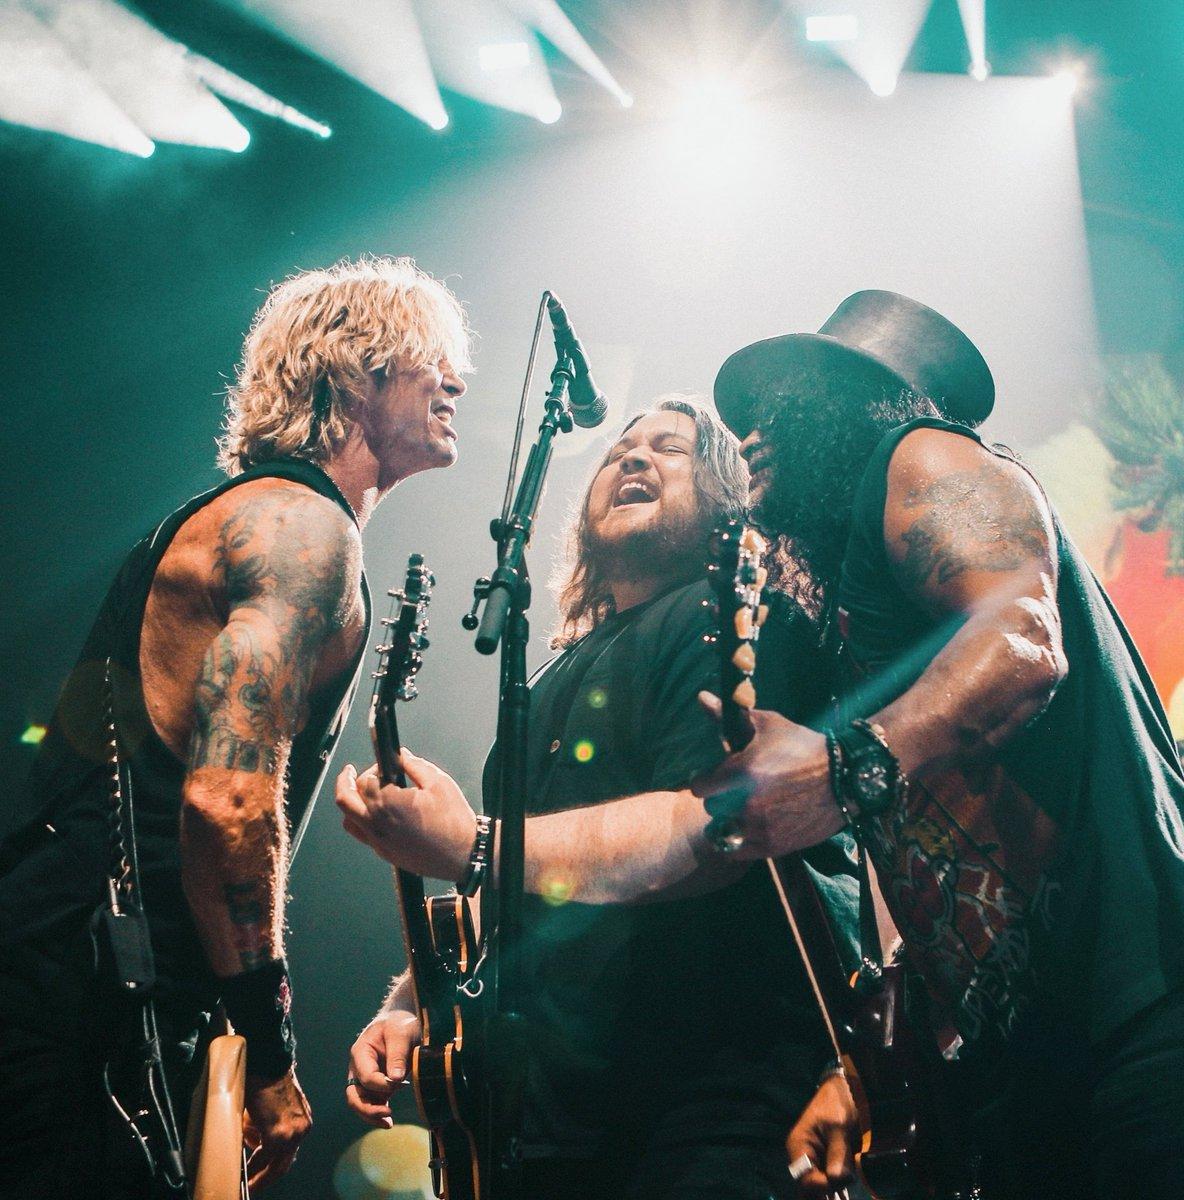 2021.10.02 - Hard Rock Live Arena, Hollywood, FL, USA Faynzg10